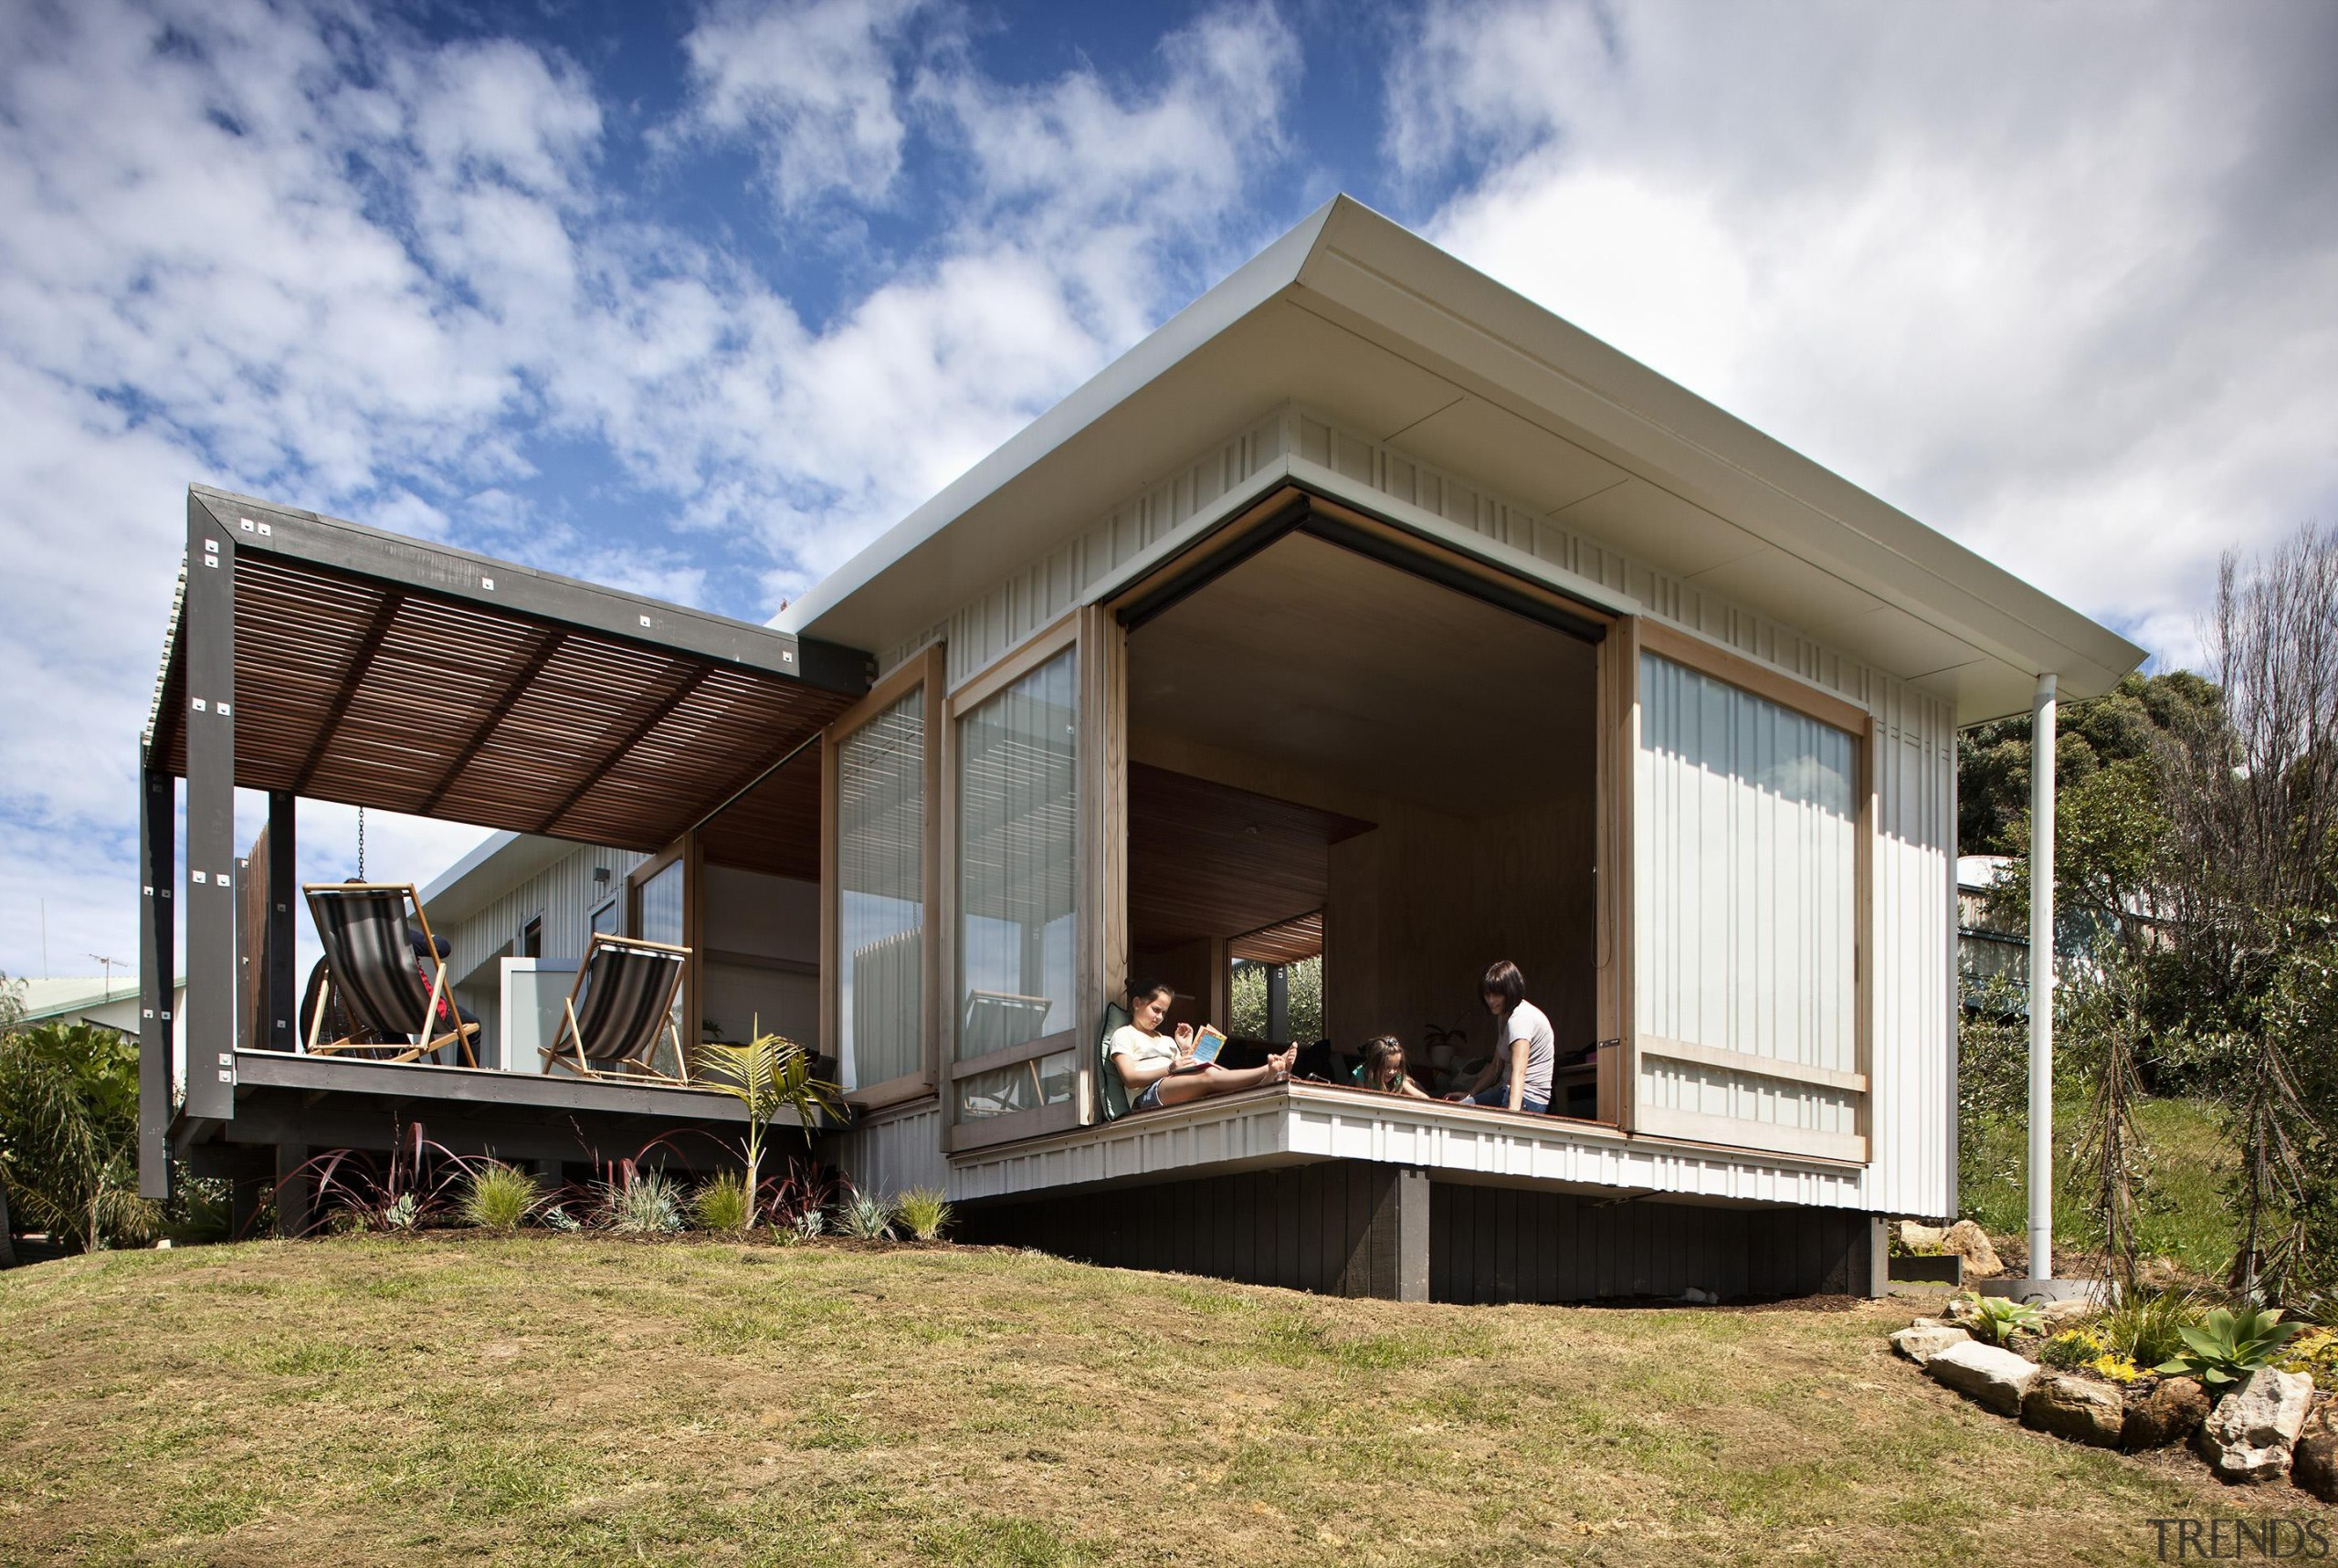 Coromandel, New Zealand - Studio 19 Onemana Bach architecture, cottage, facade, home, house, property, real estate, white